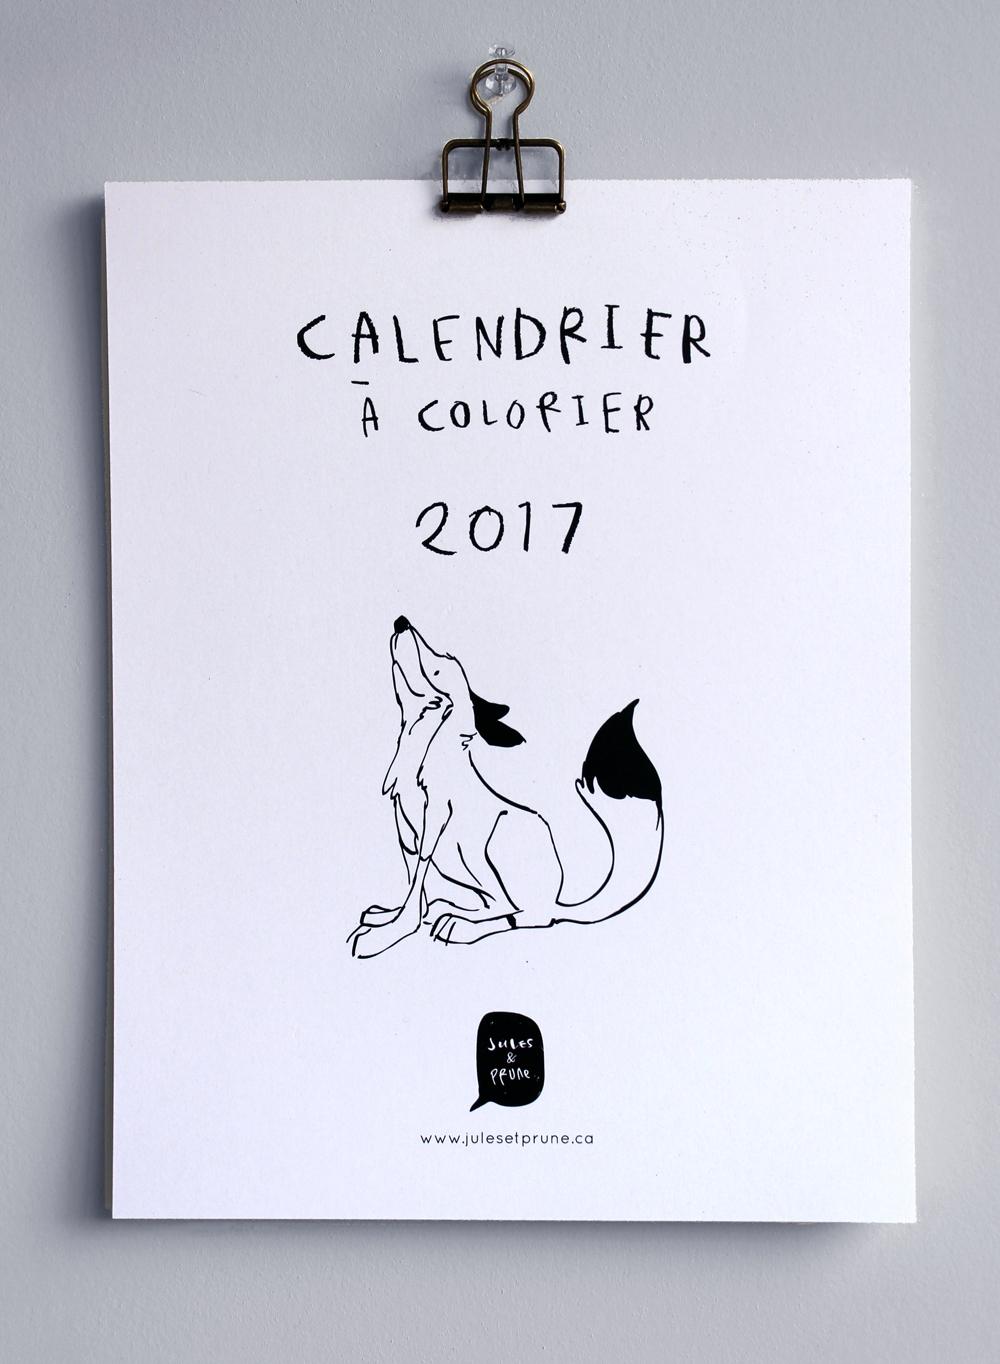 Calendrier_a_colorier.jpg